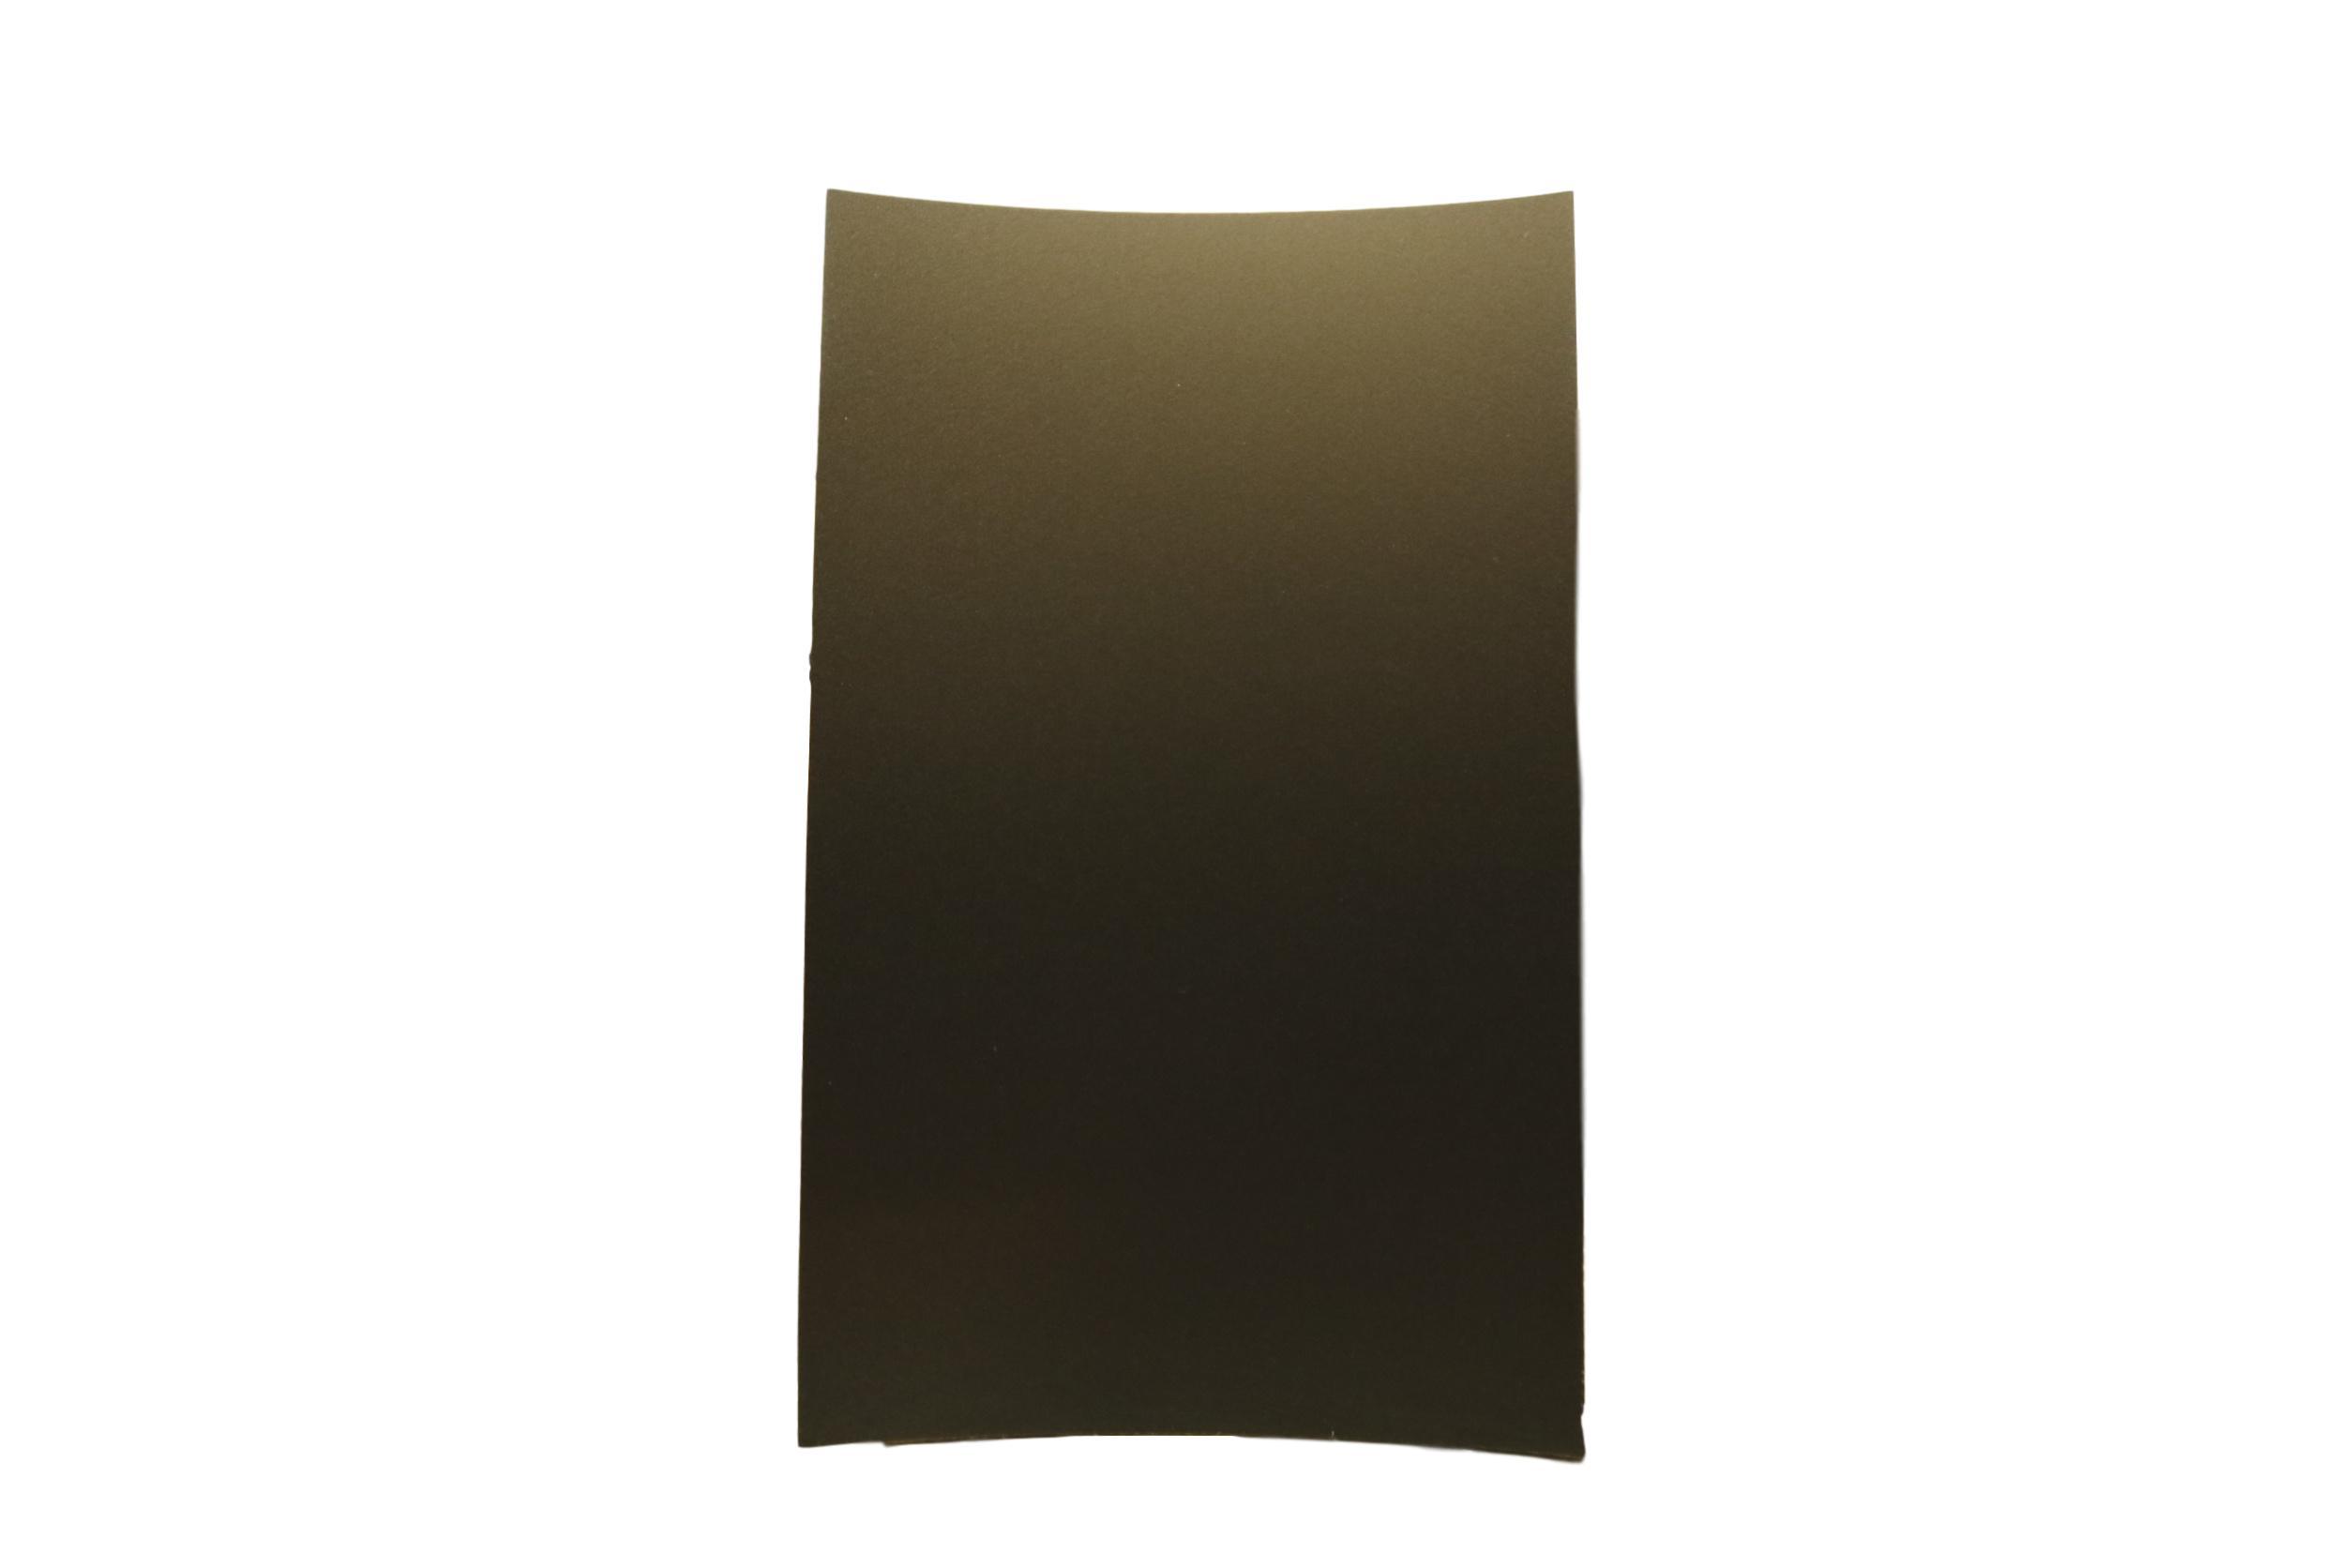 Conveyor Belting Black PVC 2 PLY Fabric Back 2.0mm